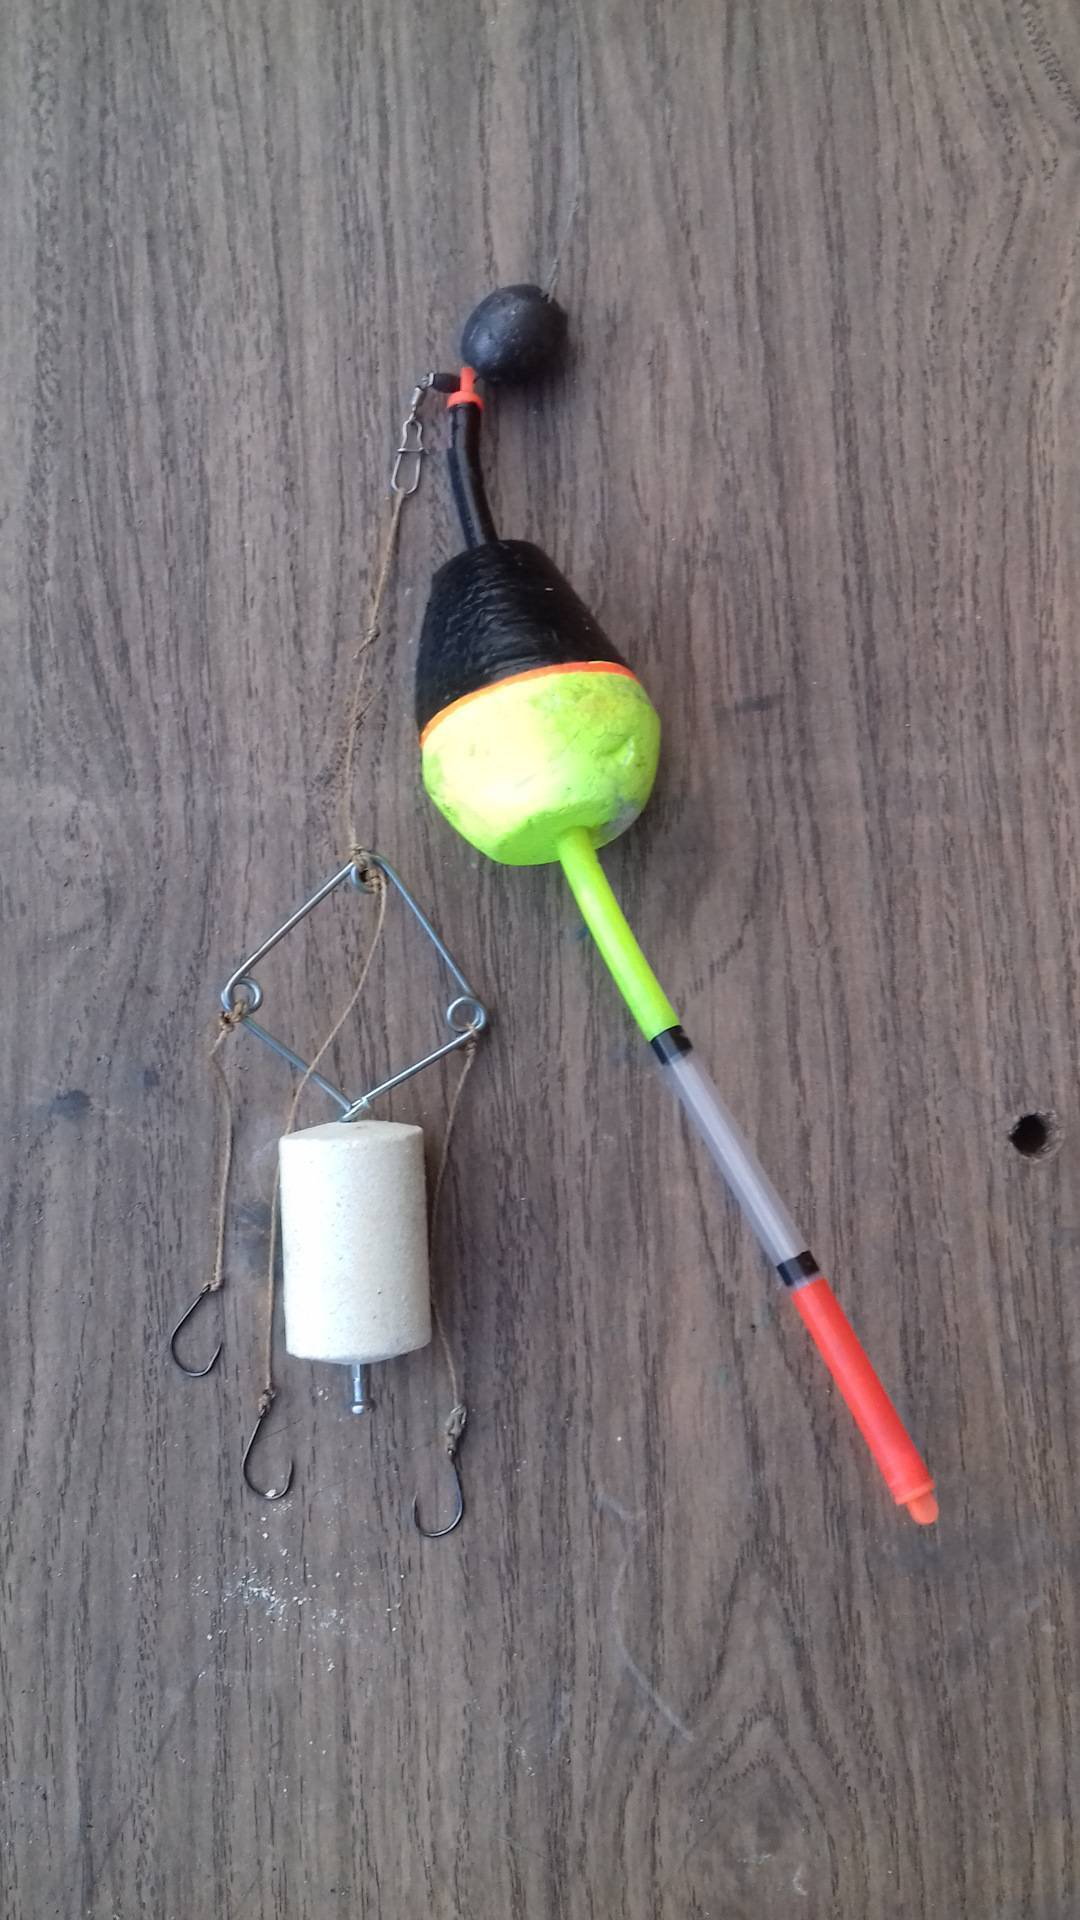 Ловля толстолобика на технопланктон - как ловить - снасти - видео